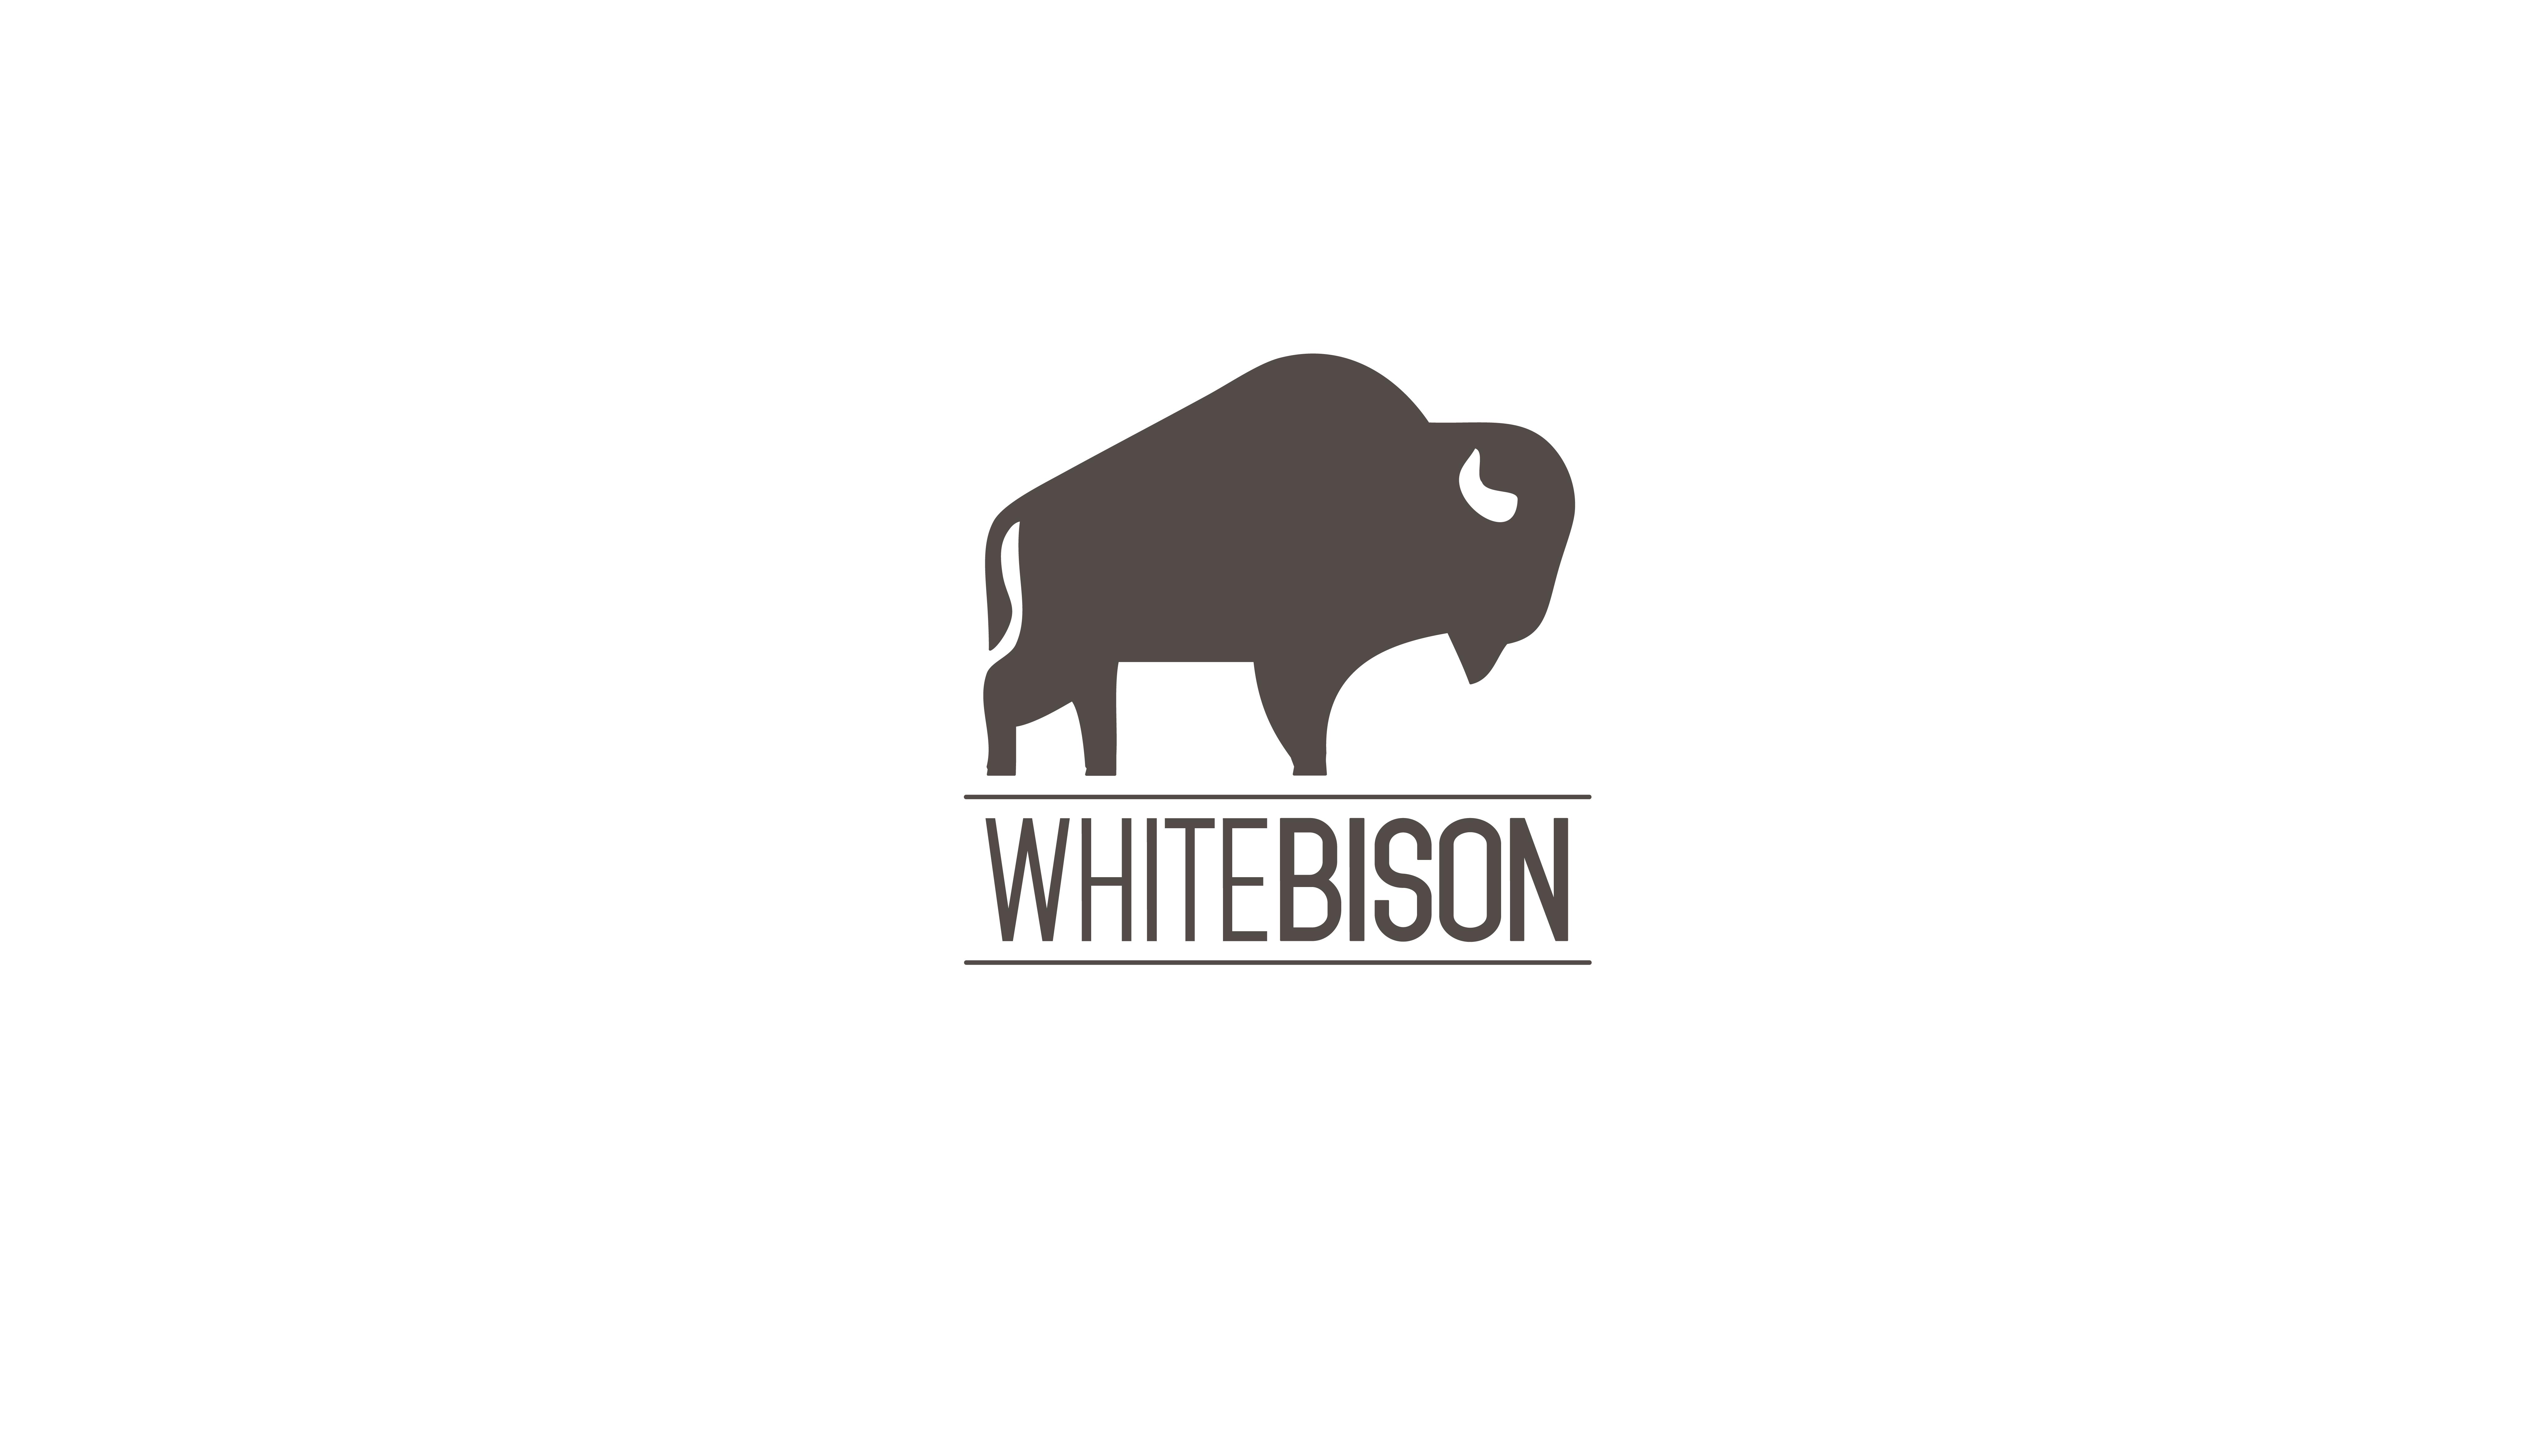 WhiteBison